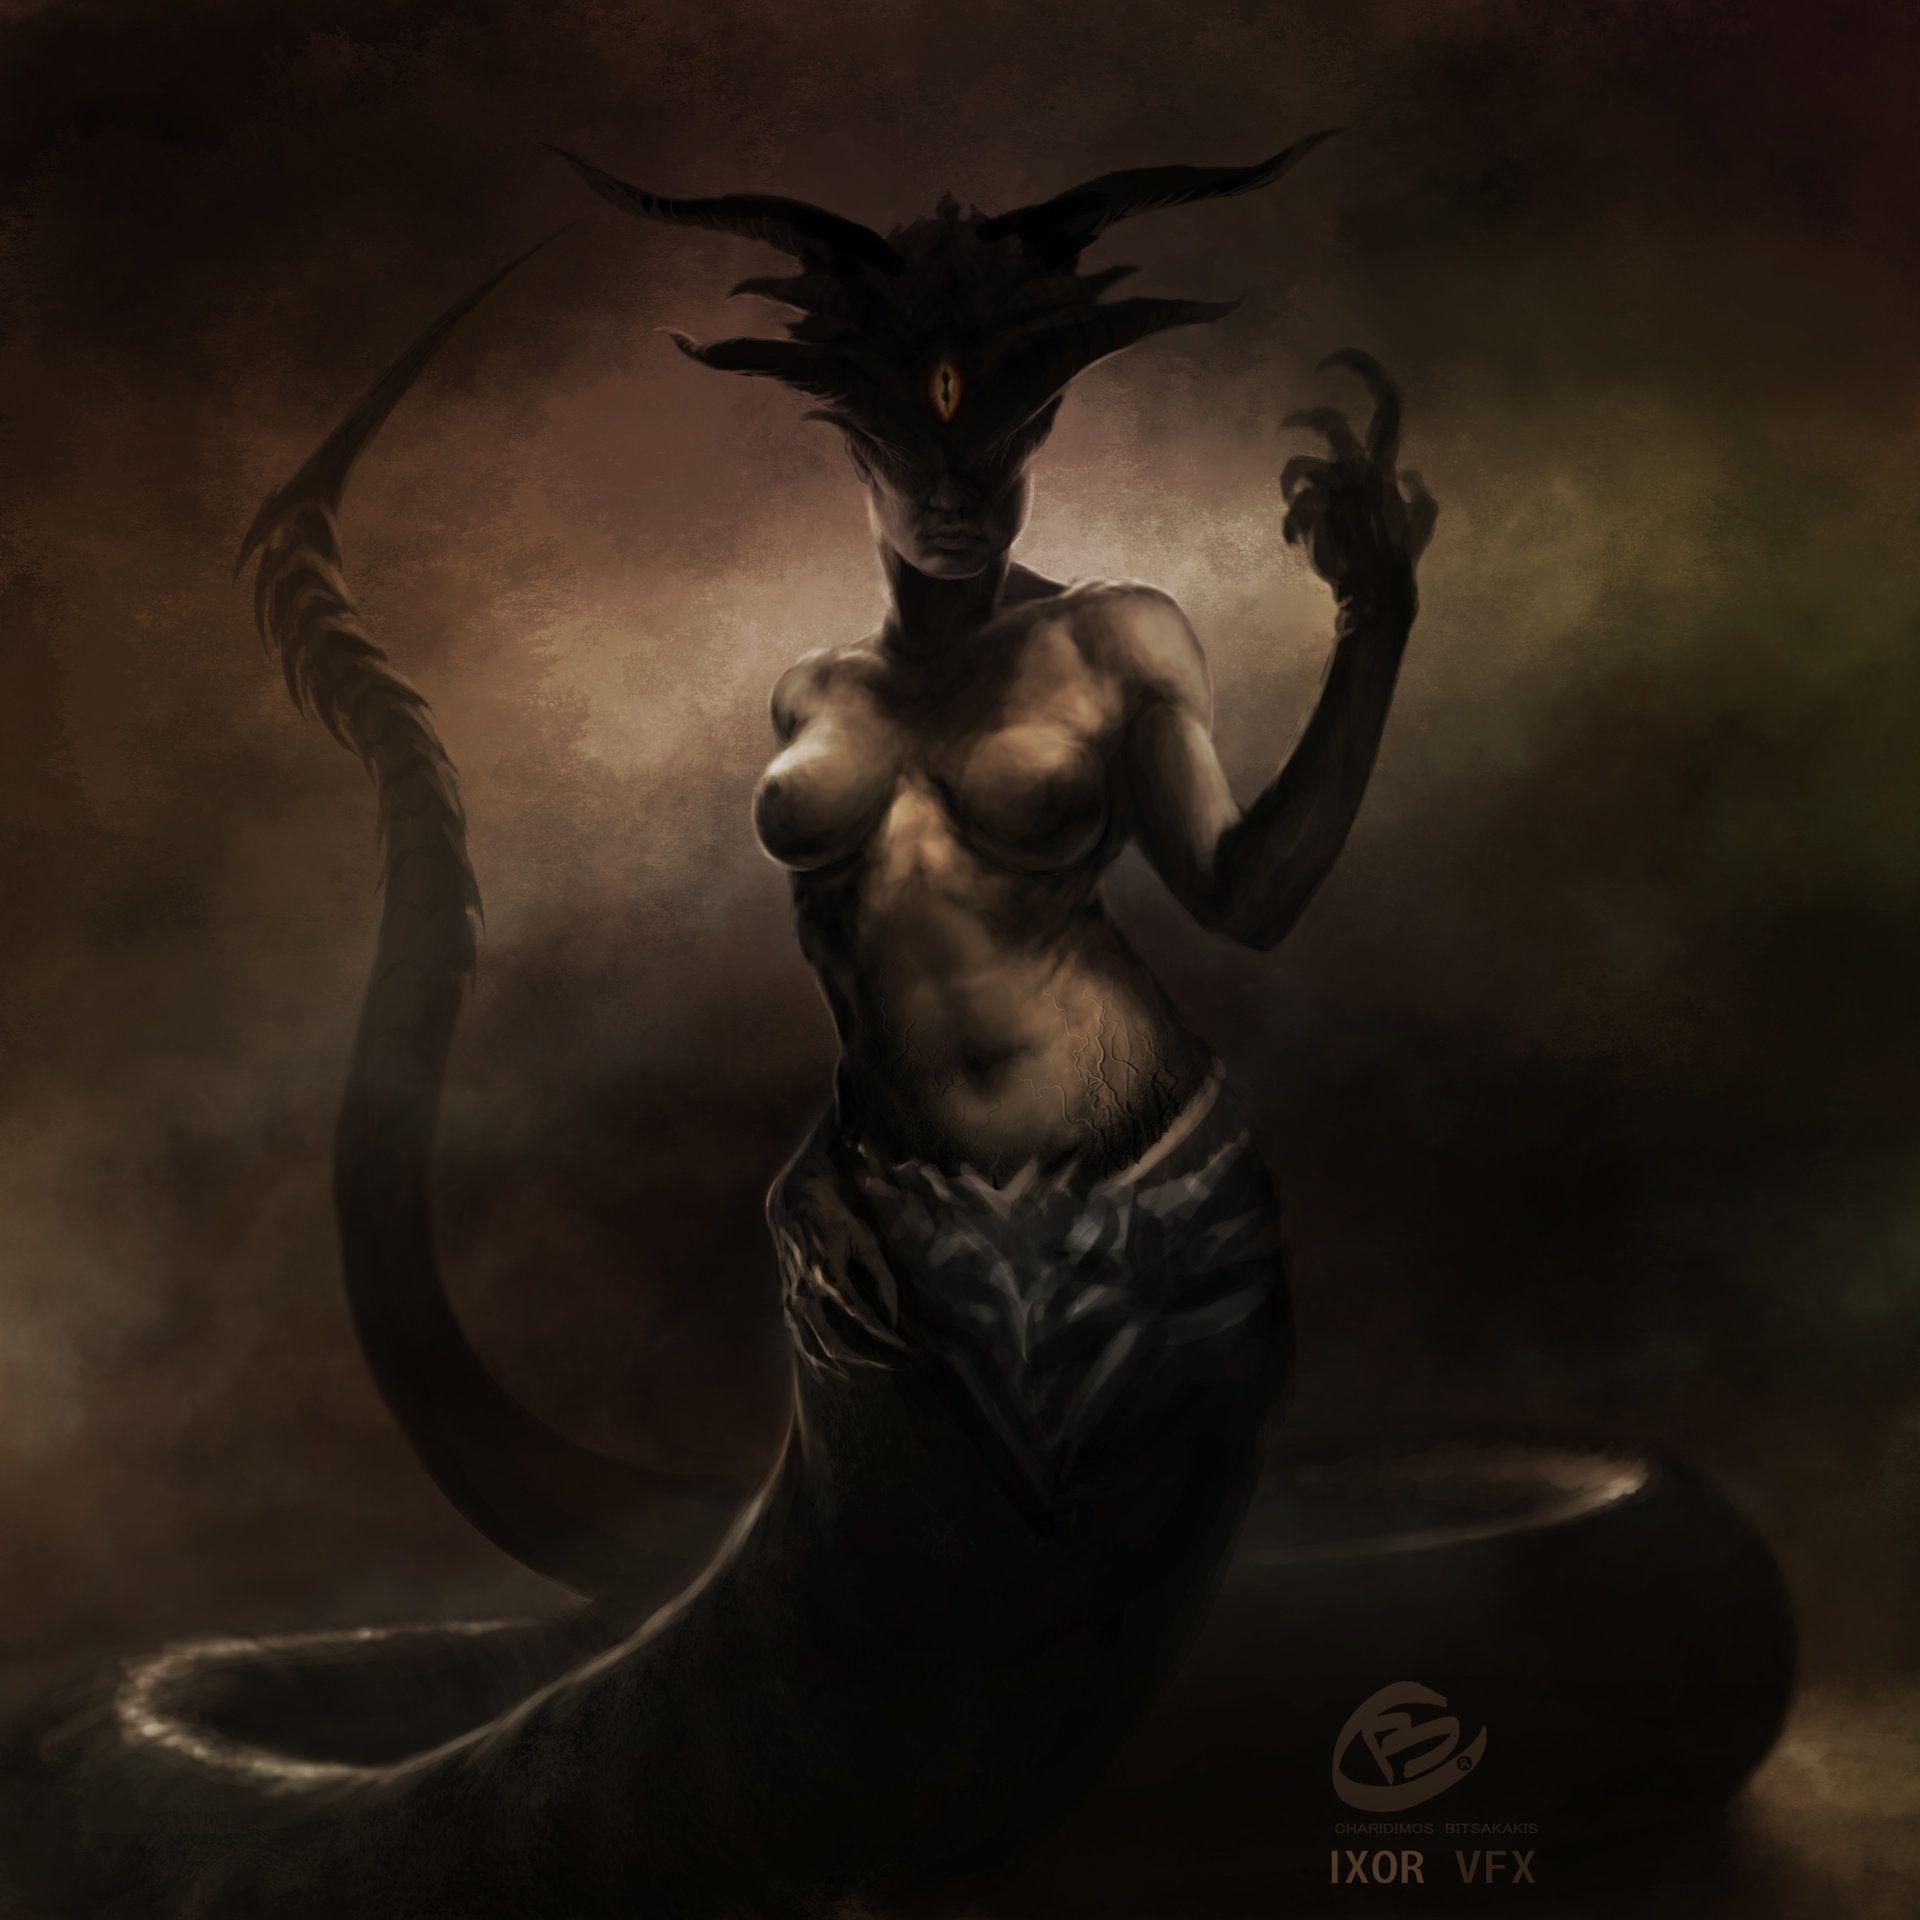 CAMPE/KAMPE - a monstrous Drakaina (she - dragon) who was ...